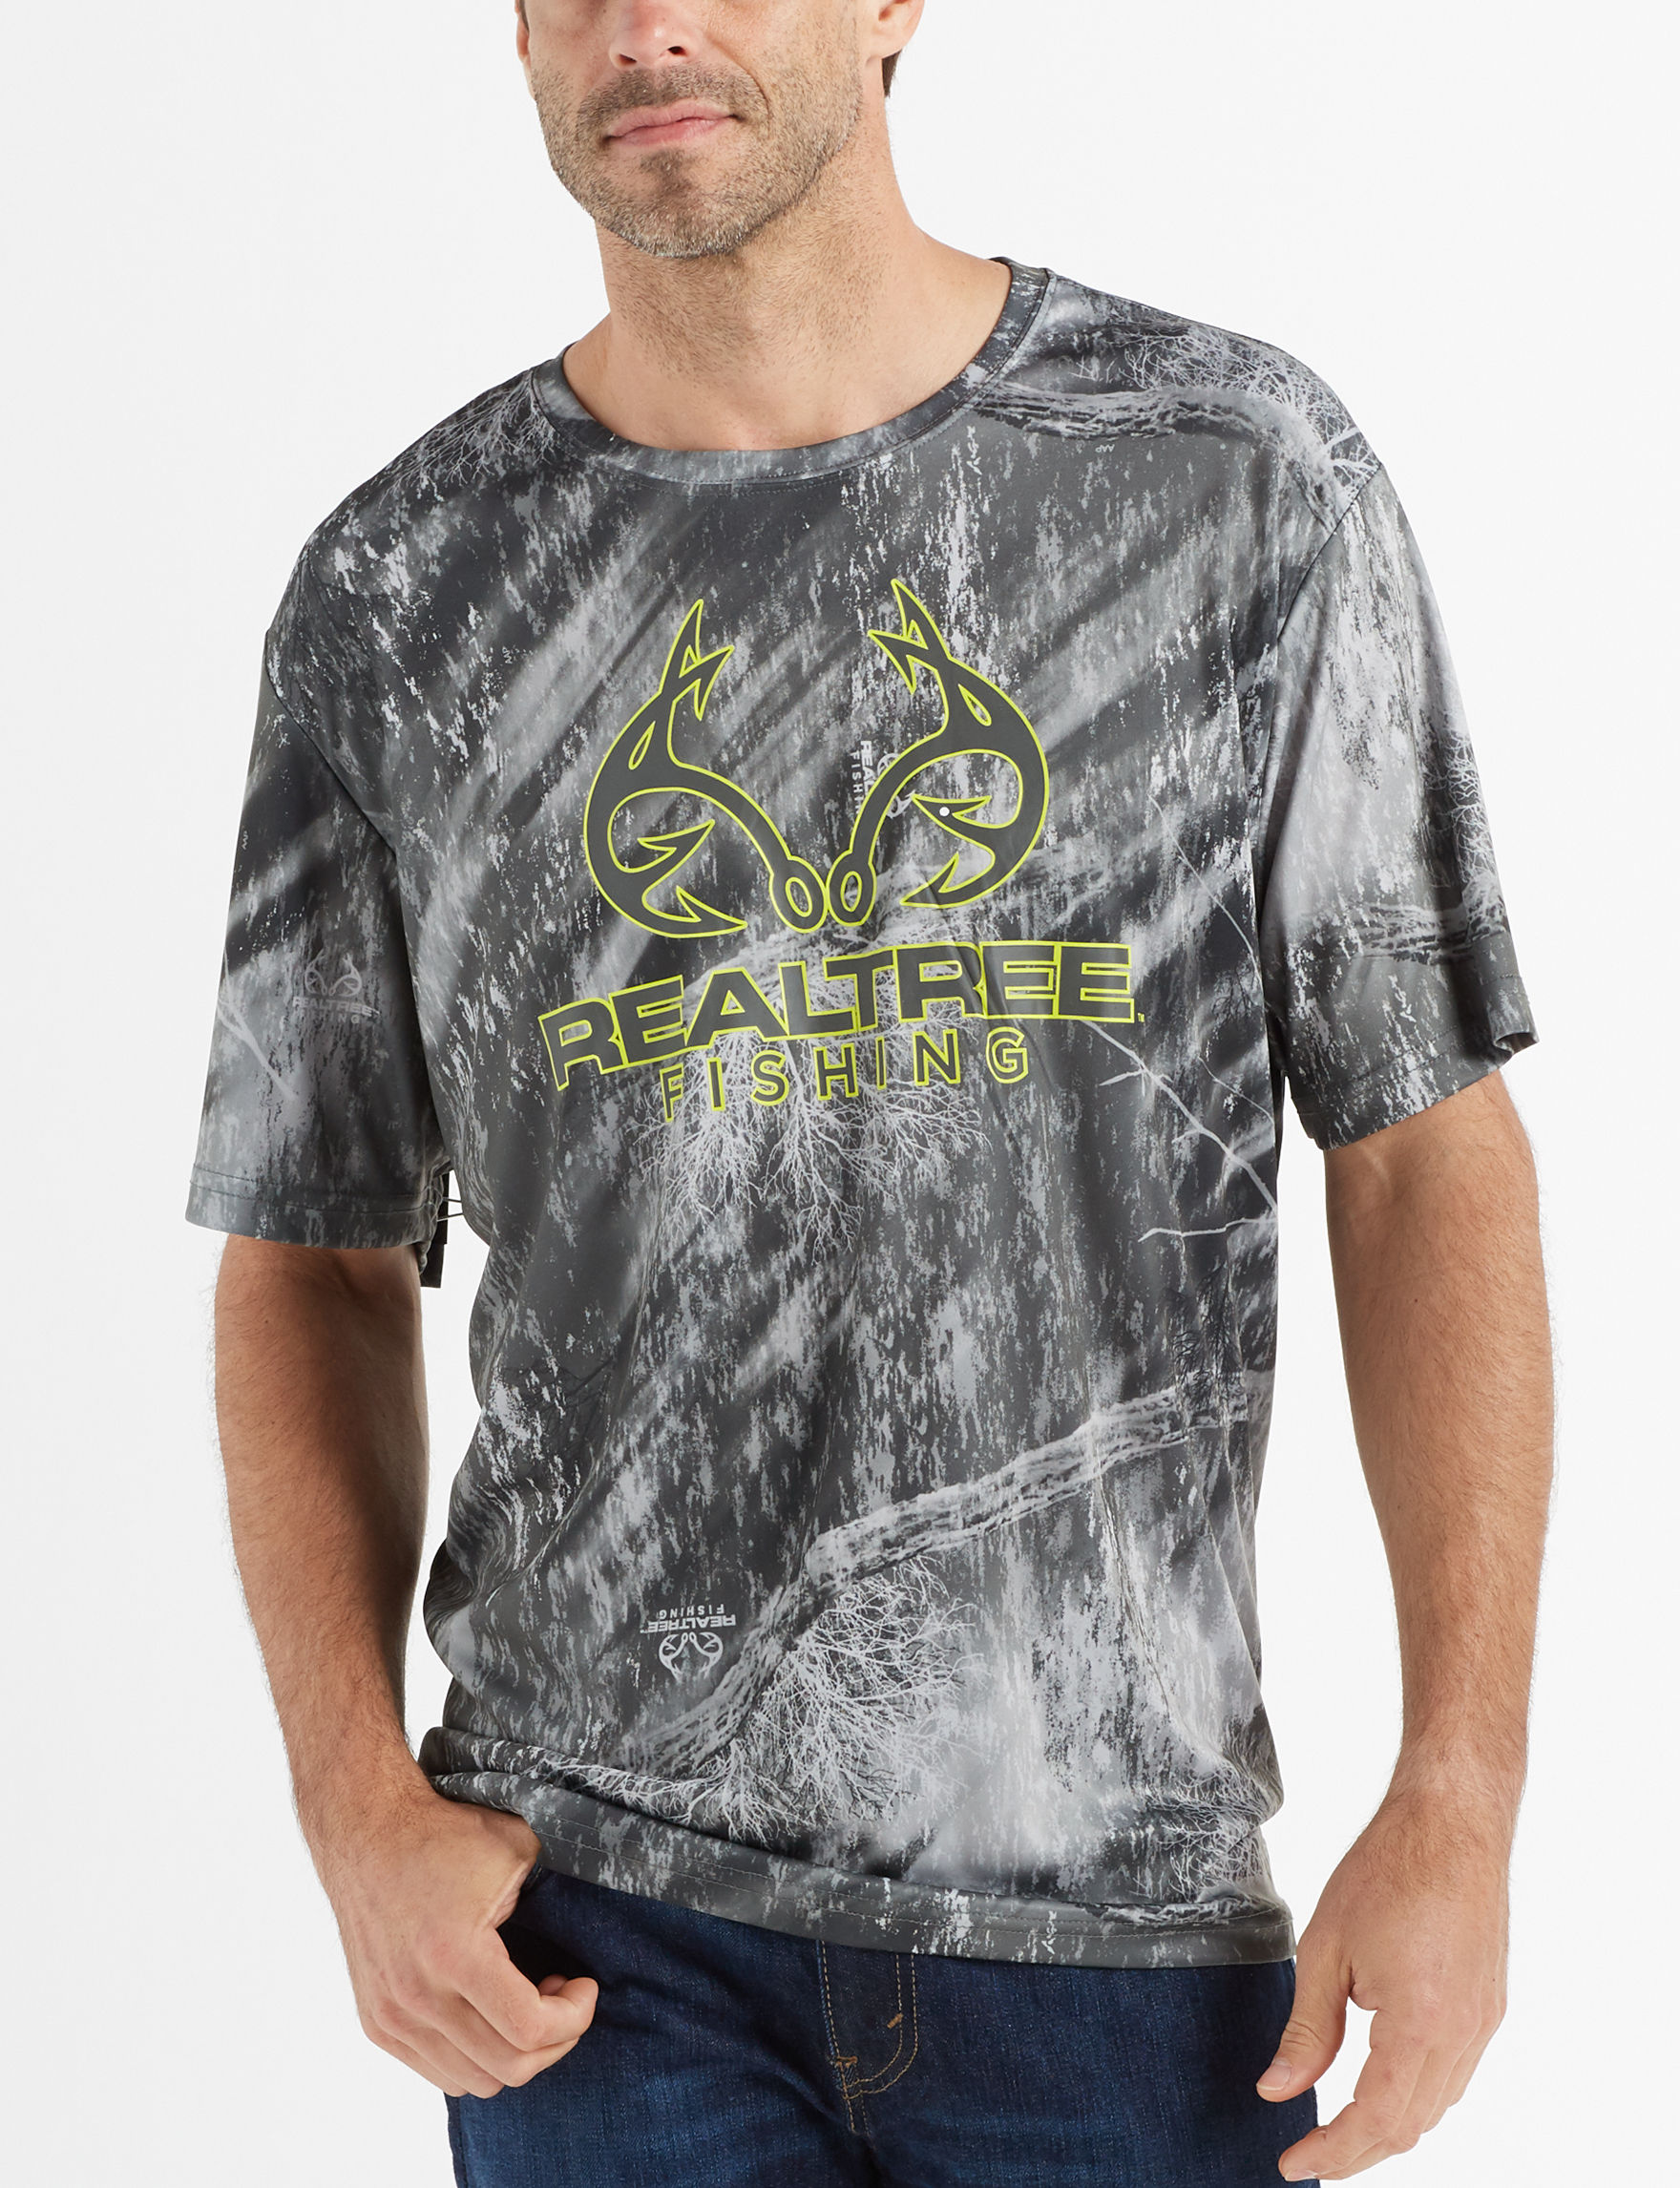 5f6786f4227e5 Realtree Men's Camo Fishing T-shirt | Stage Stores